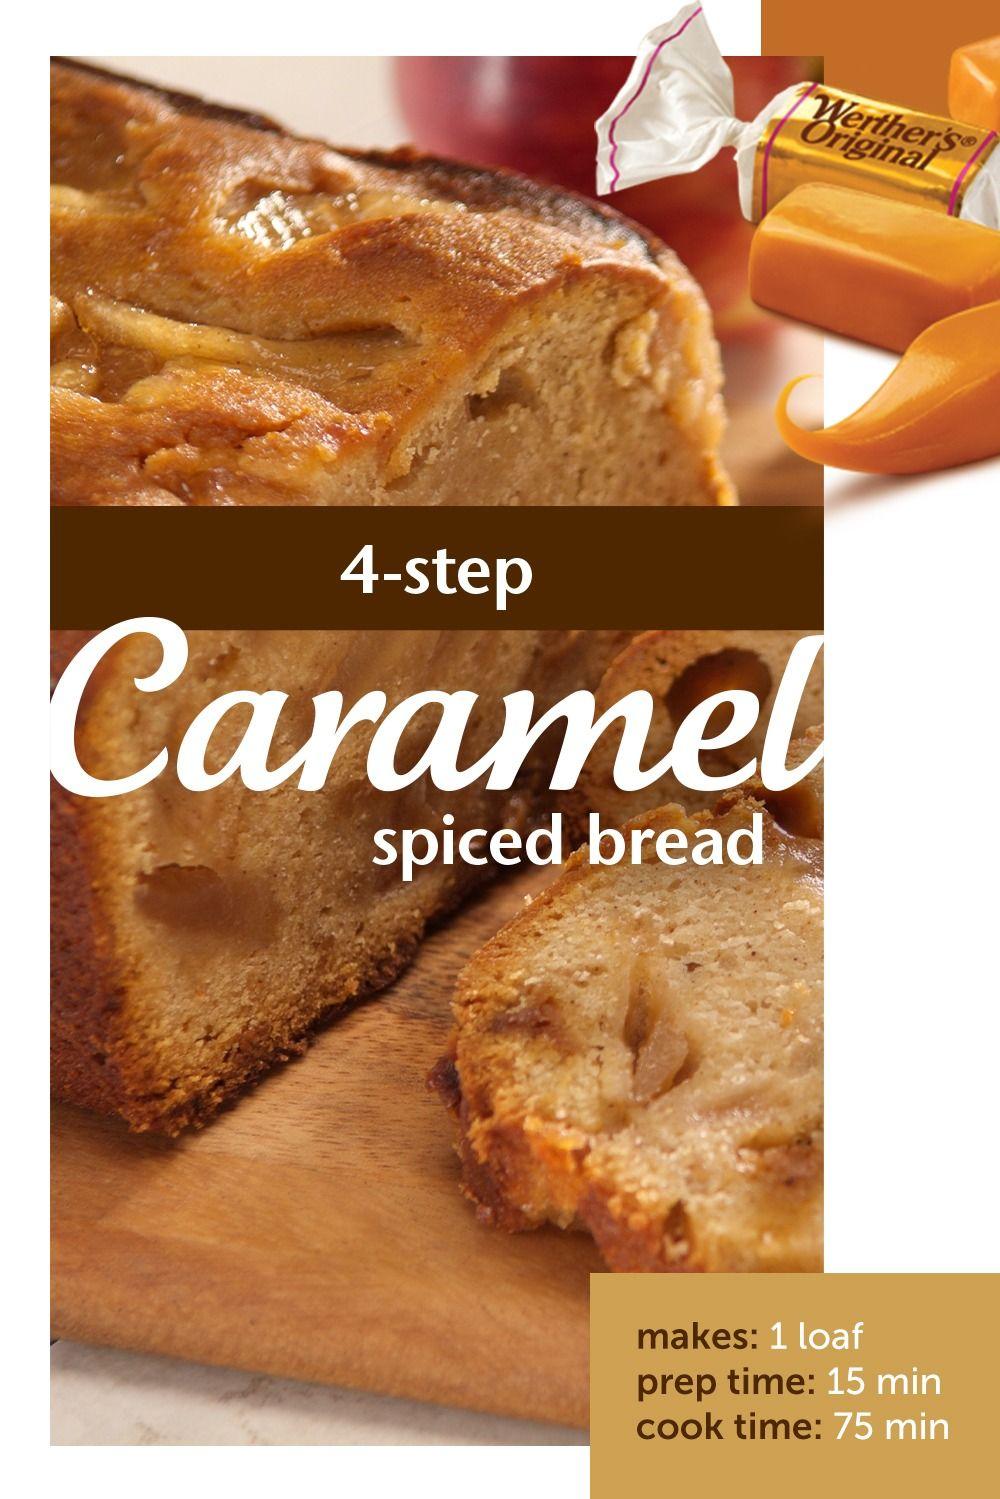 4 Step Caramel Spiced Bread In 2020 Bread Recipes Sweet Bread Recipes Homemade Dessert Recipes